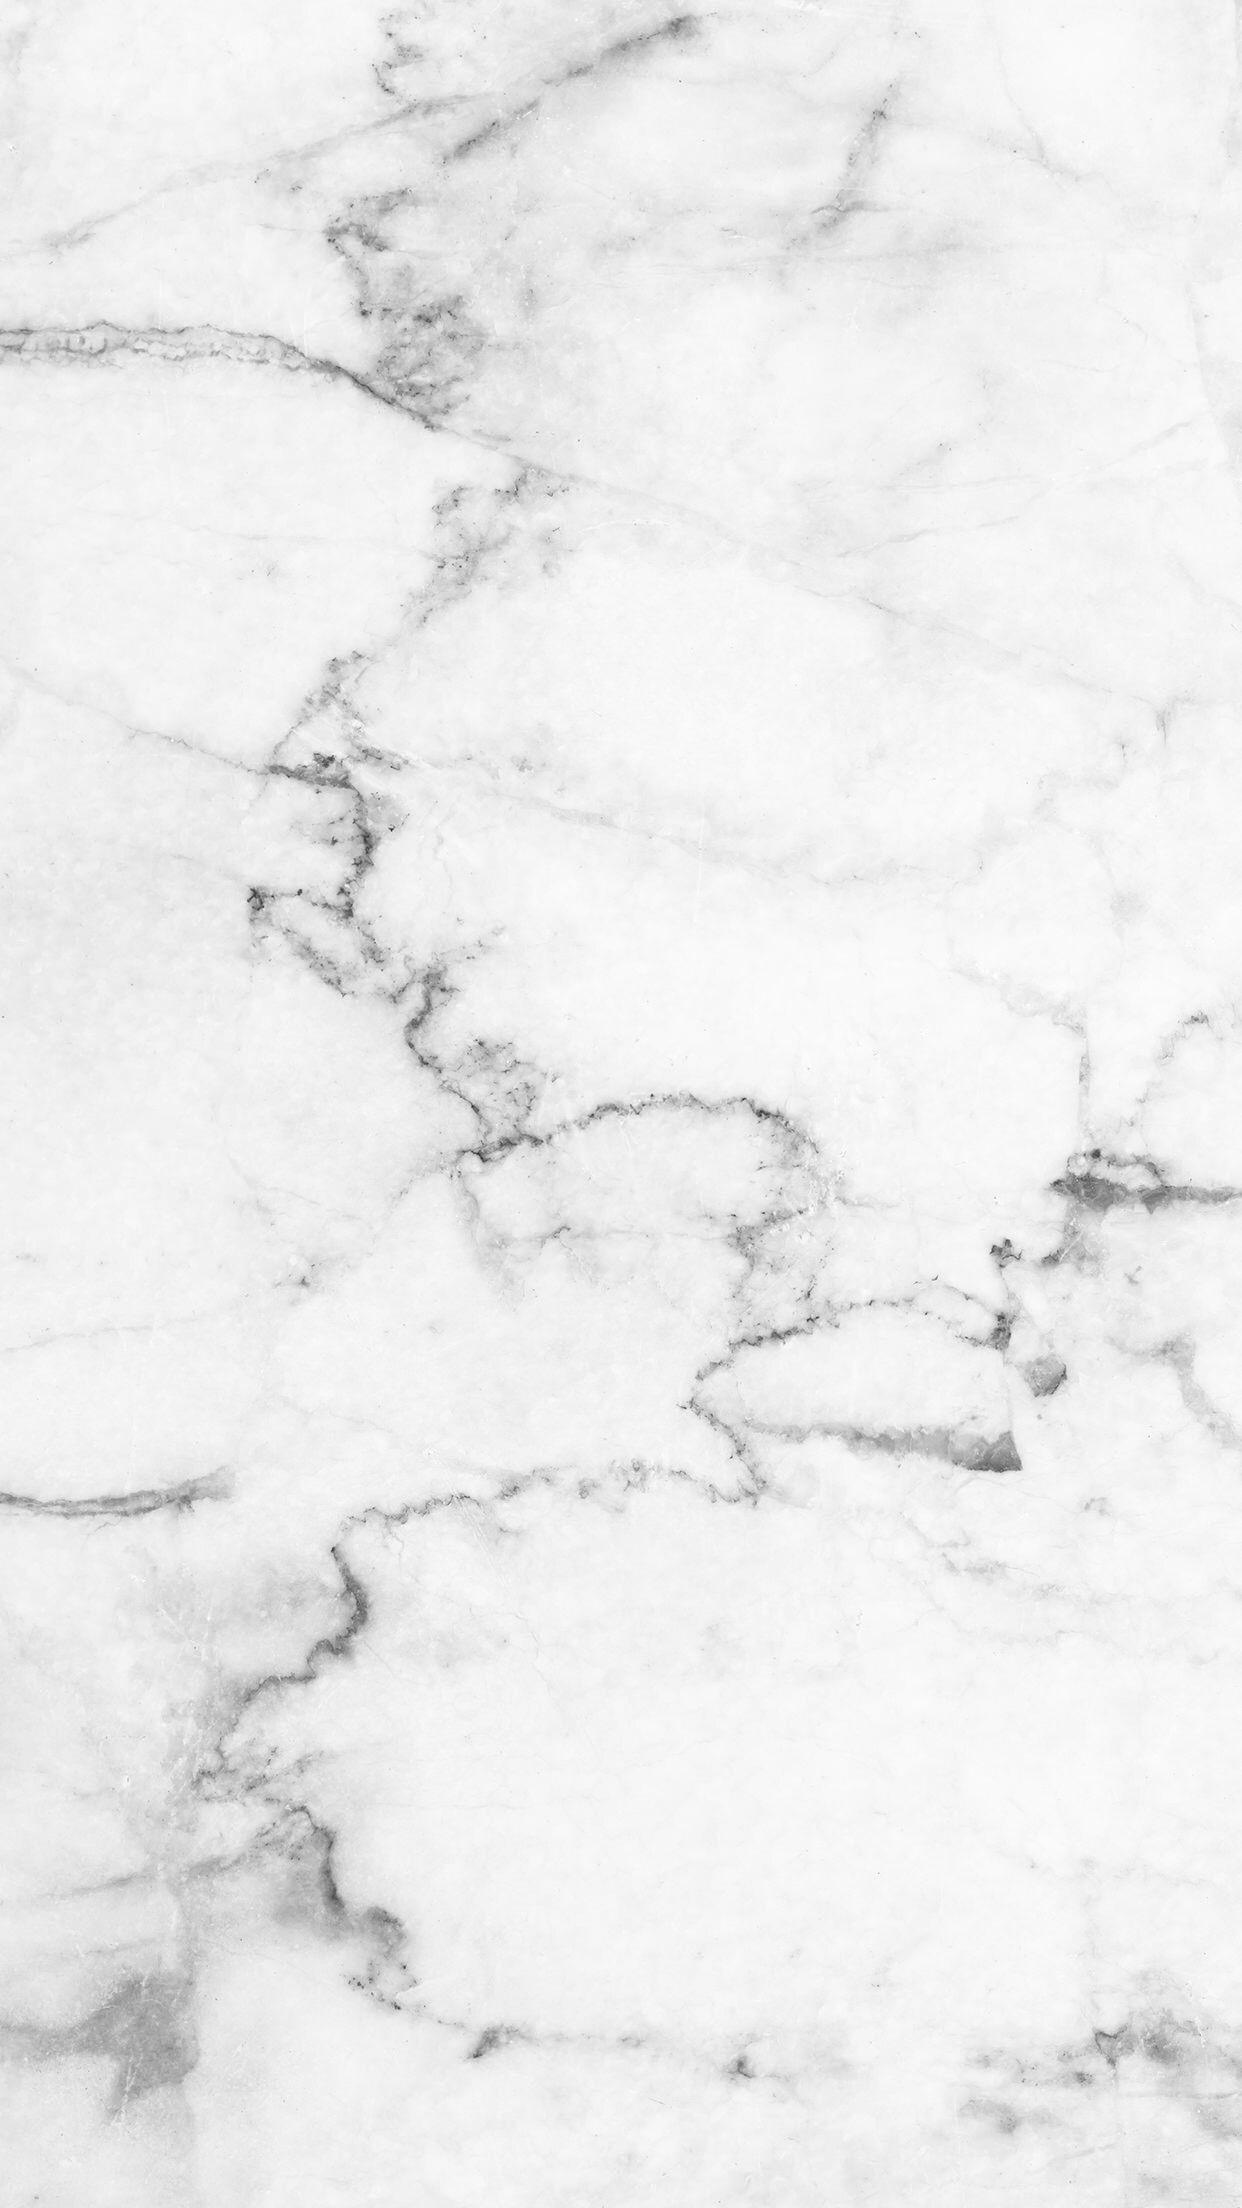 Marble iPhone Wallpaper | Sfondi per iphone, Sfondi per ...